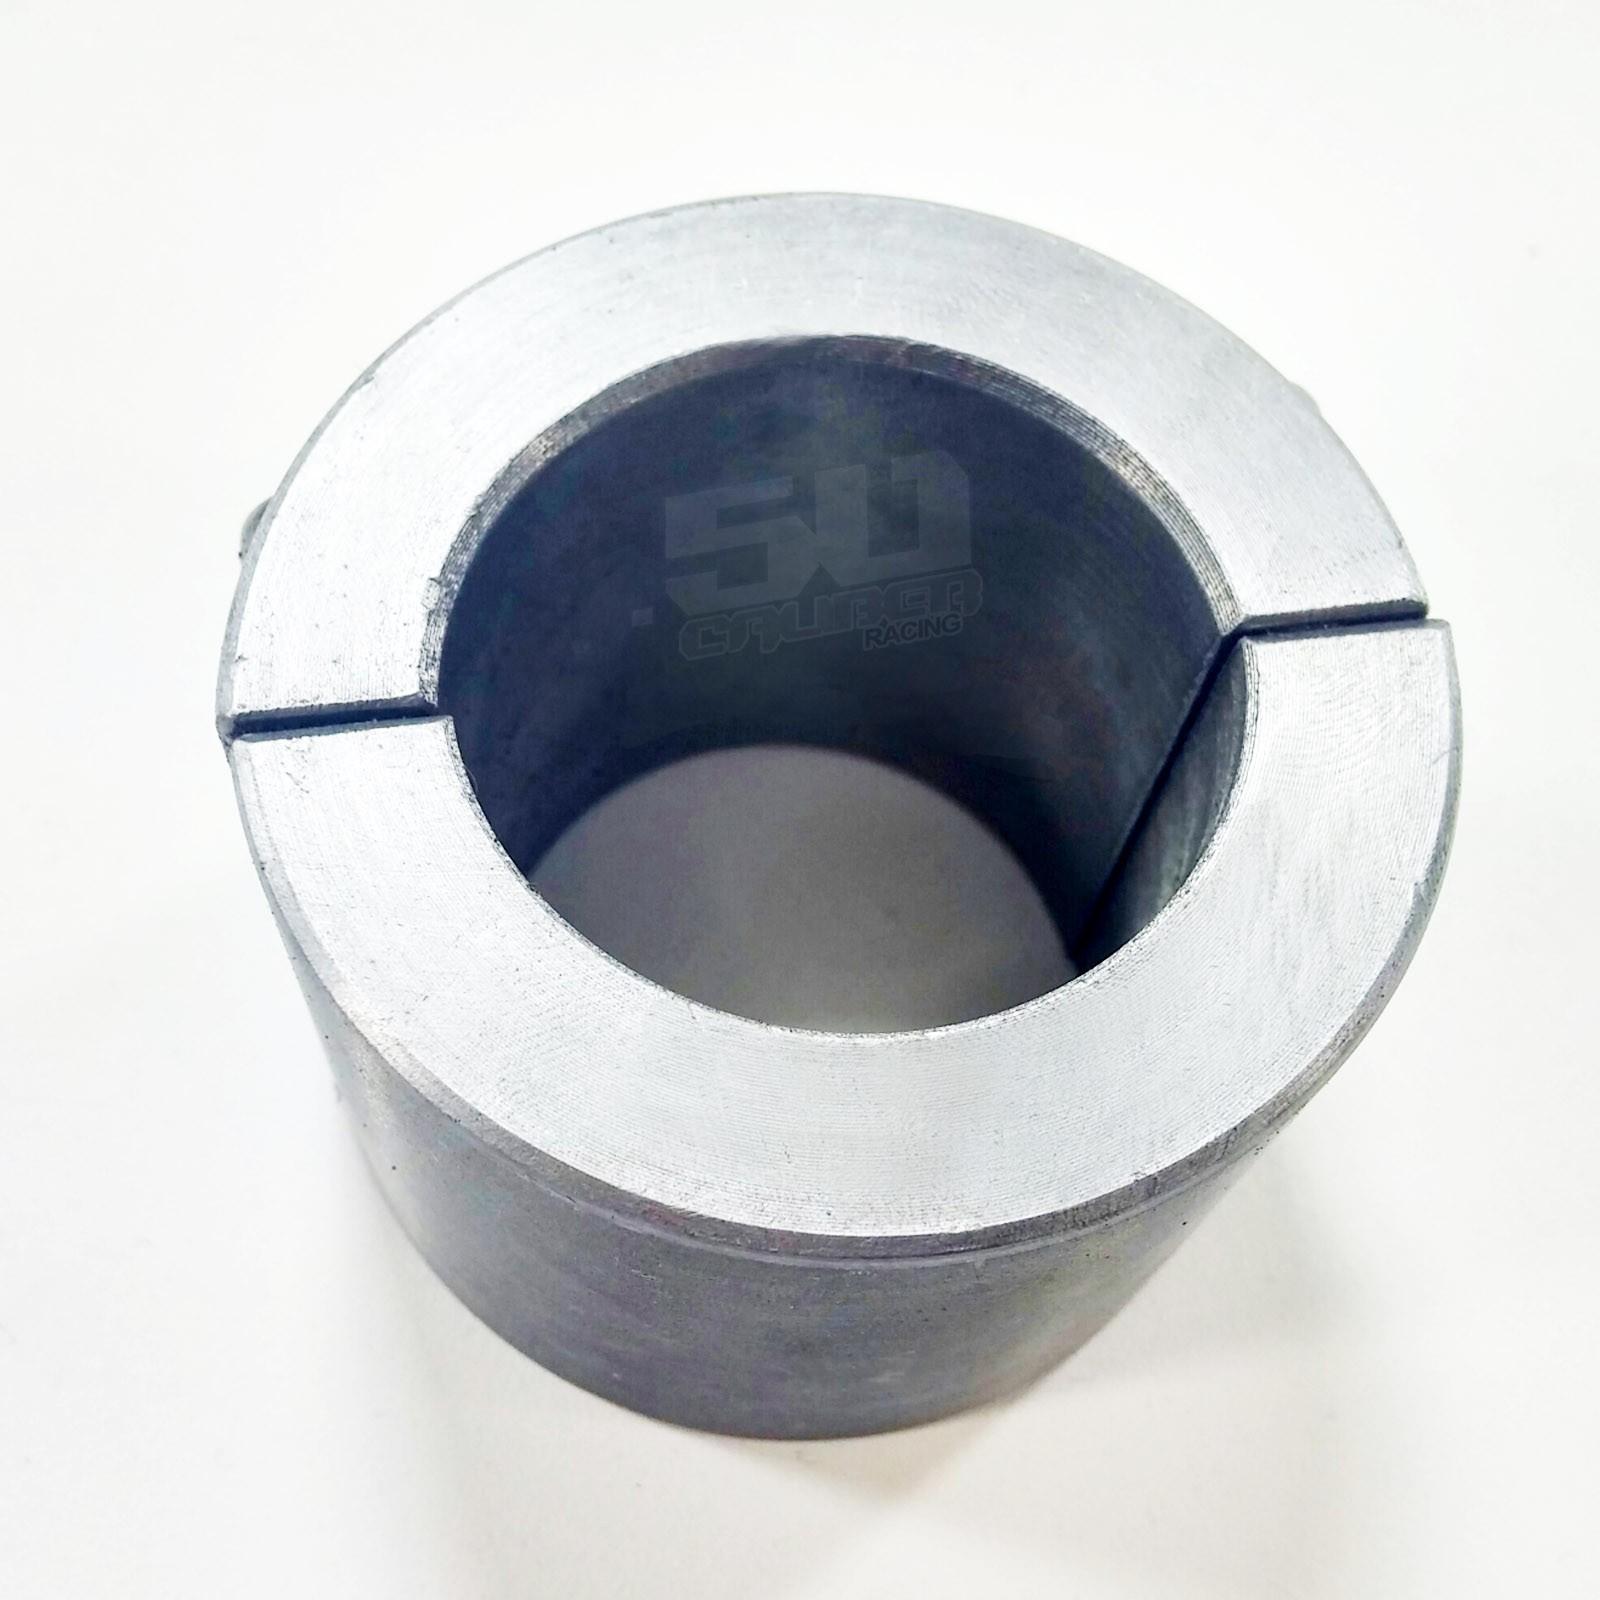 clamp tube collar split roll bar 75 od rzr am x3 utv clamps tubing round bolt inch fabrication cage polaris